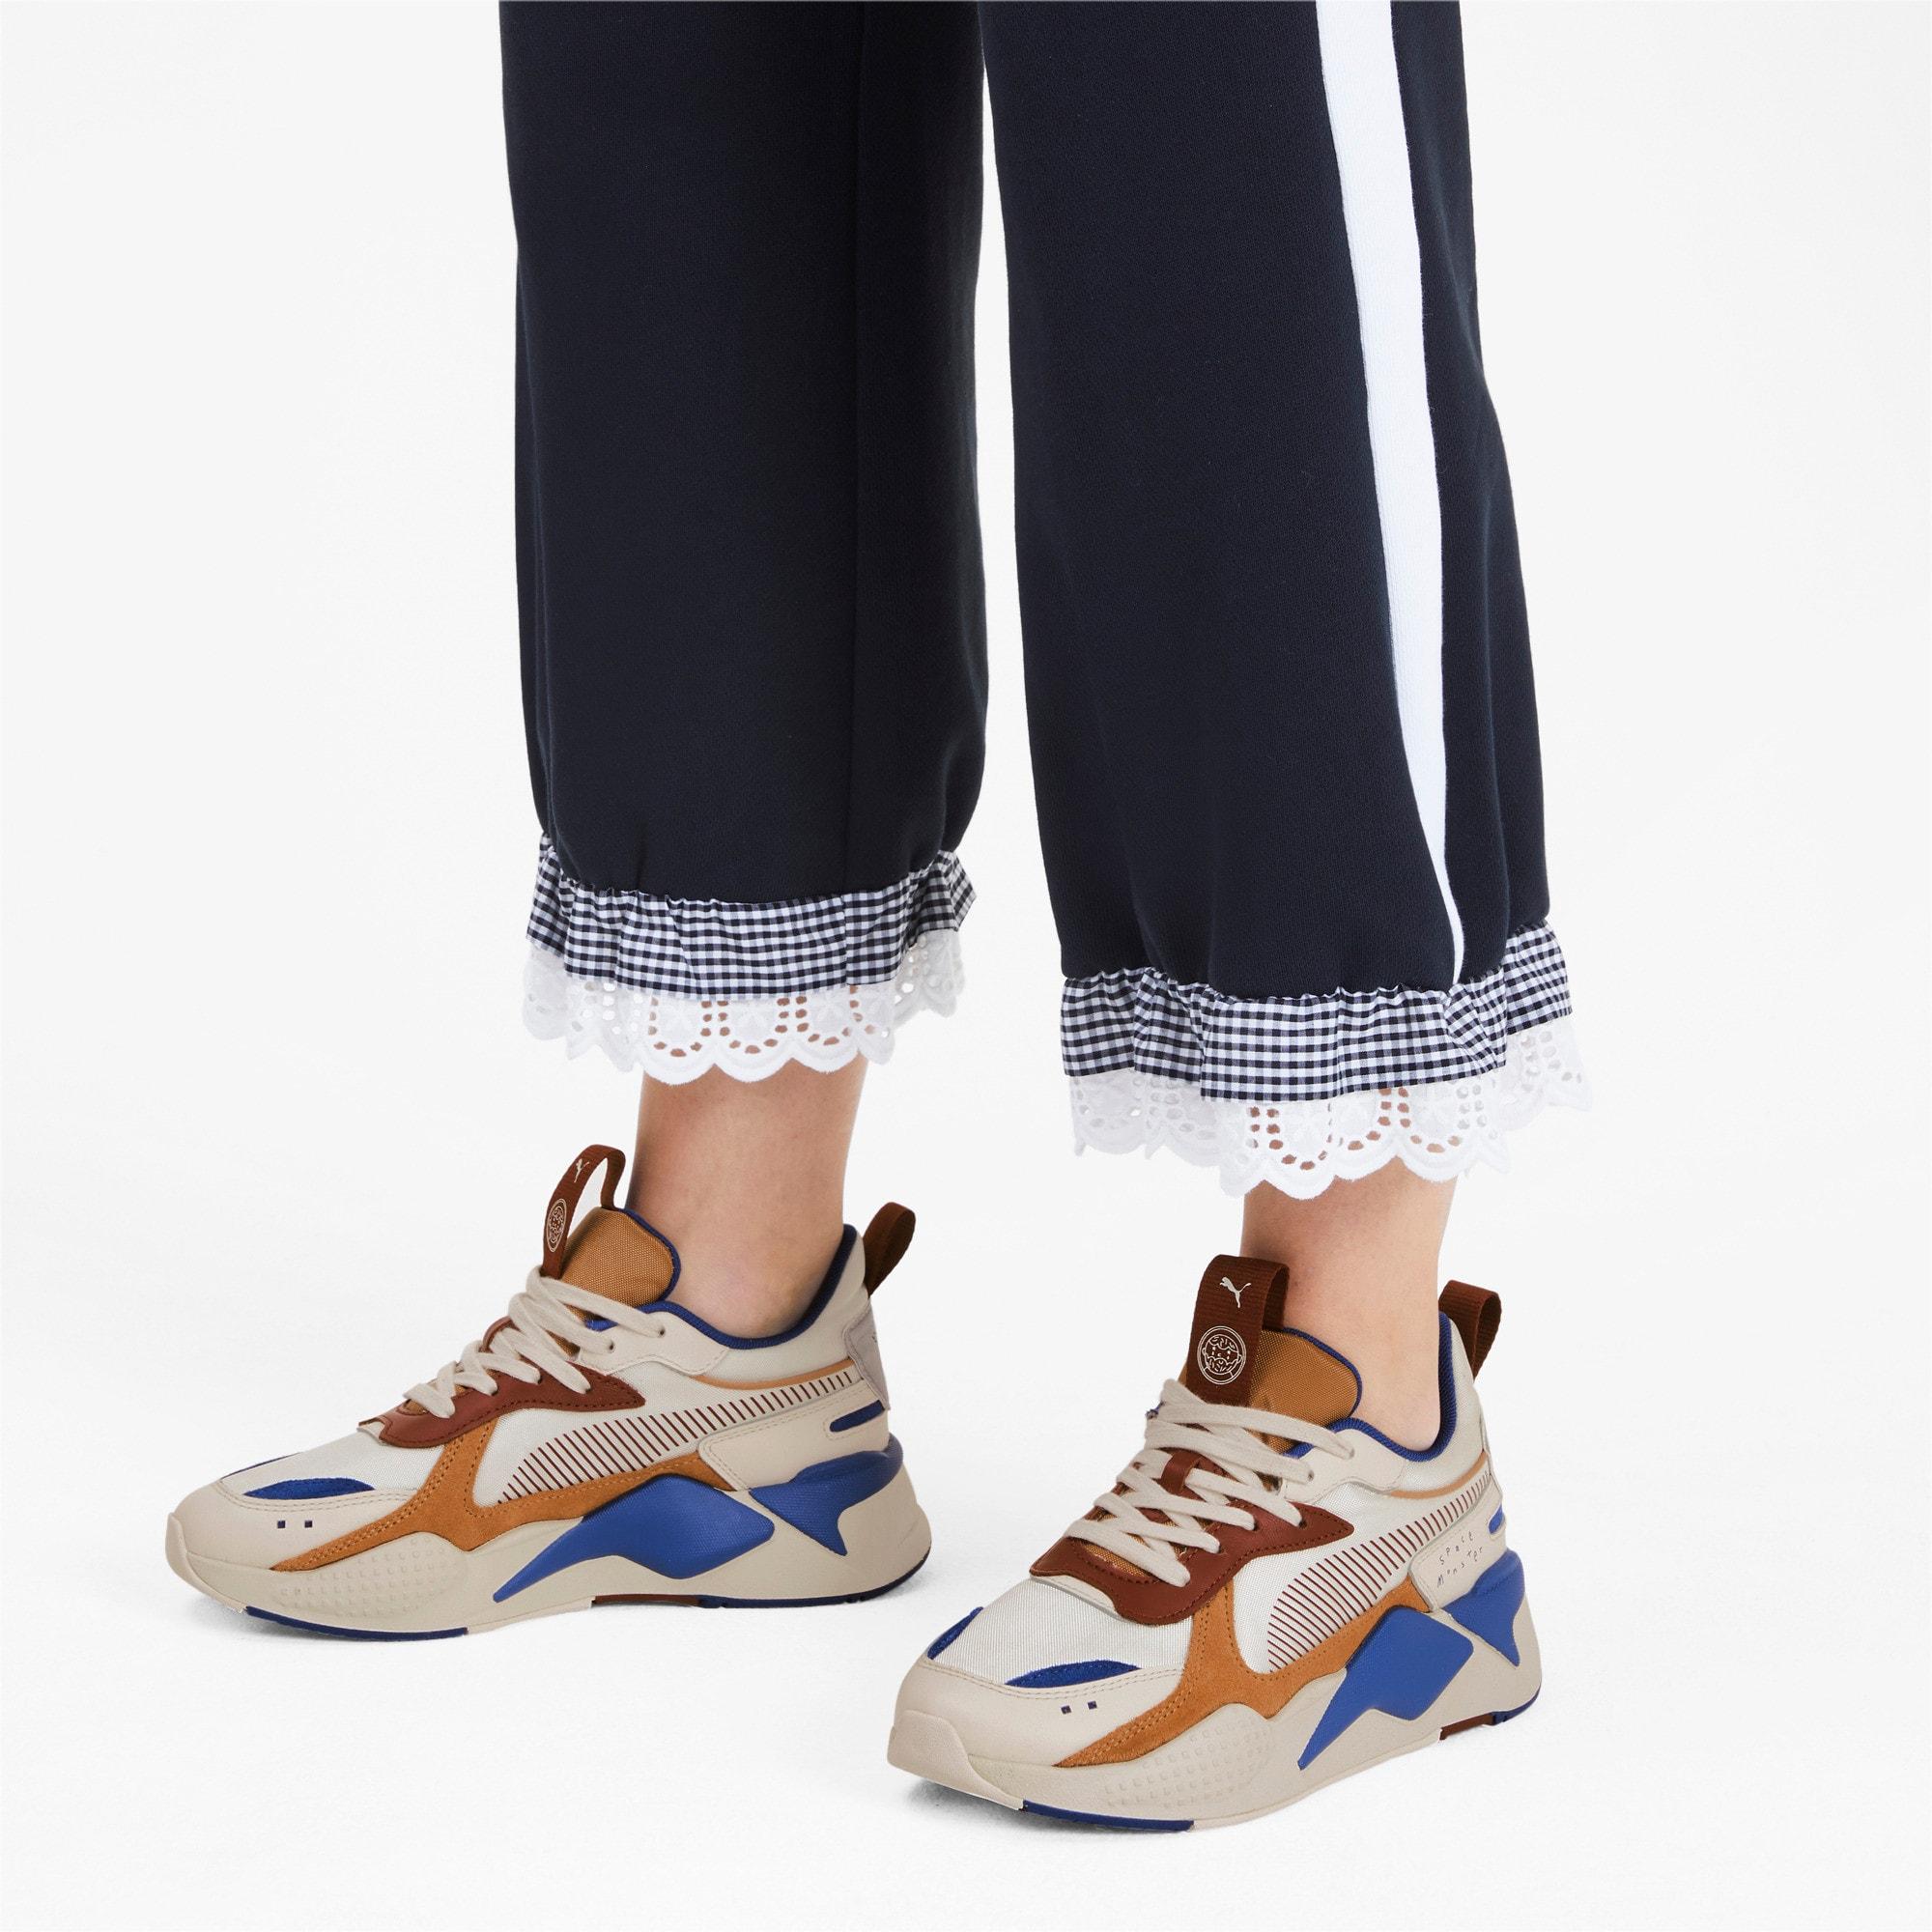 Thumbnail 2 of PUMA x TYAKASHA RS-X Sneakers, Whisper White-Fired Brick, medium